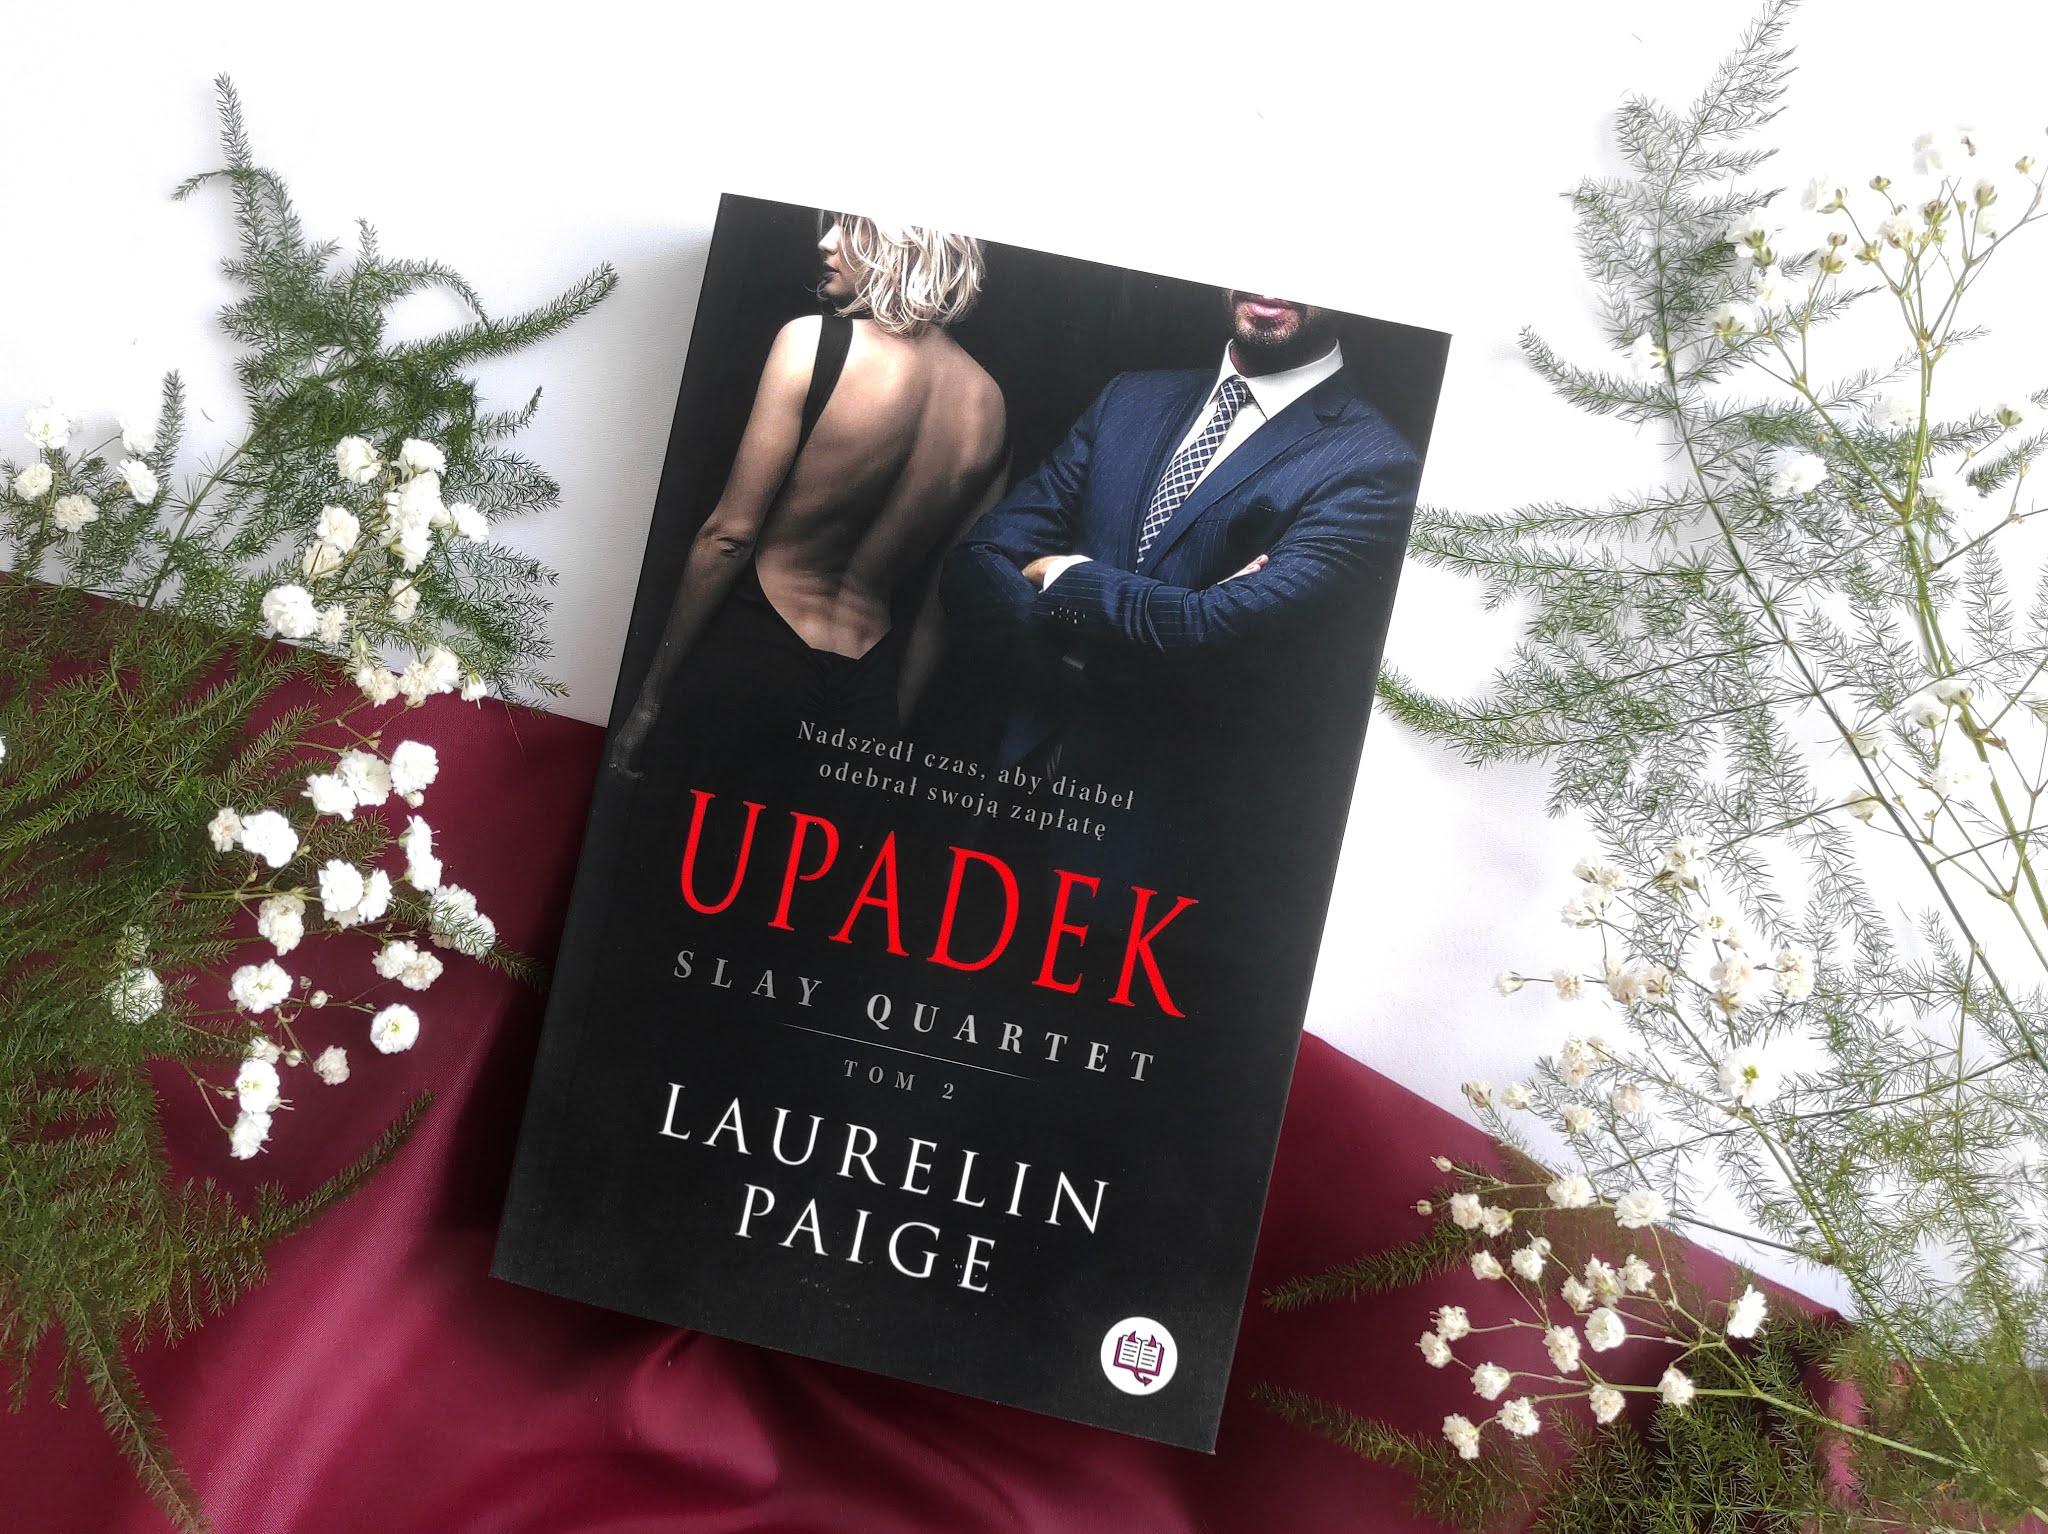 Upadek Laurelin Paige